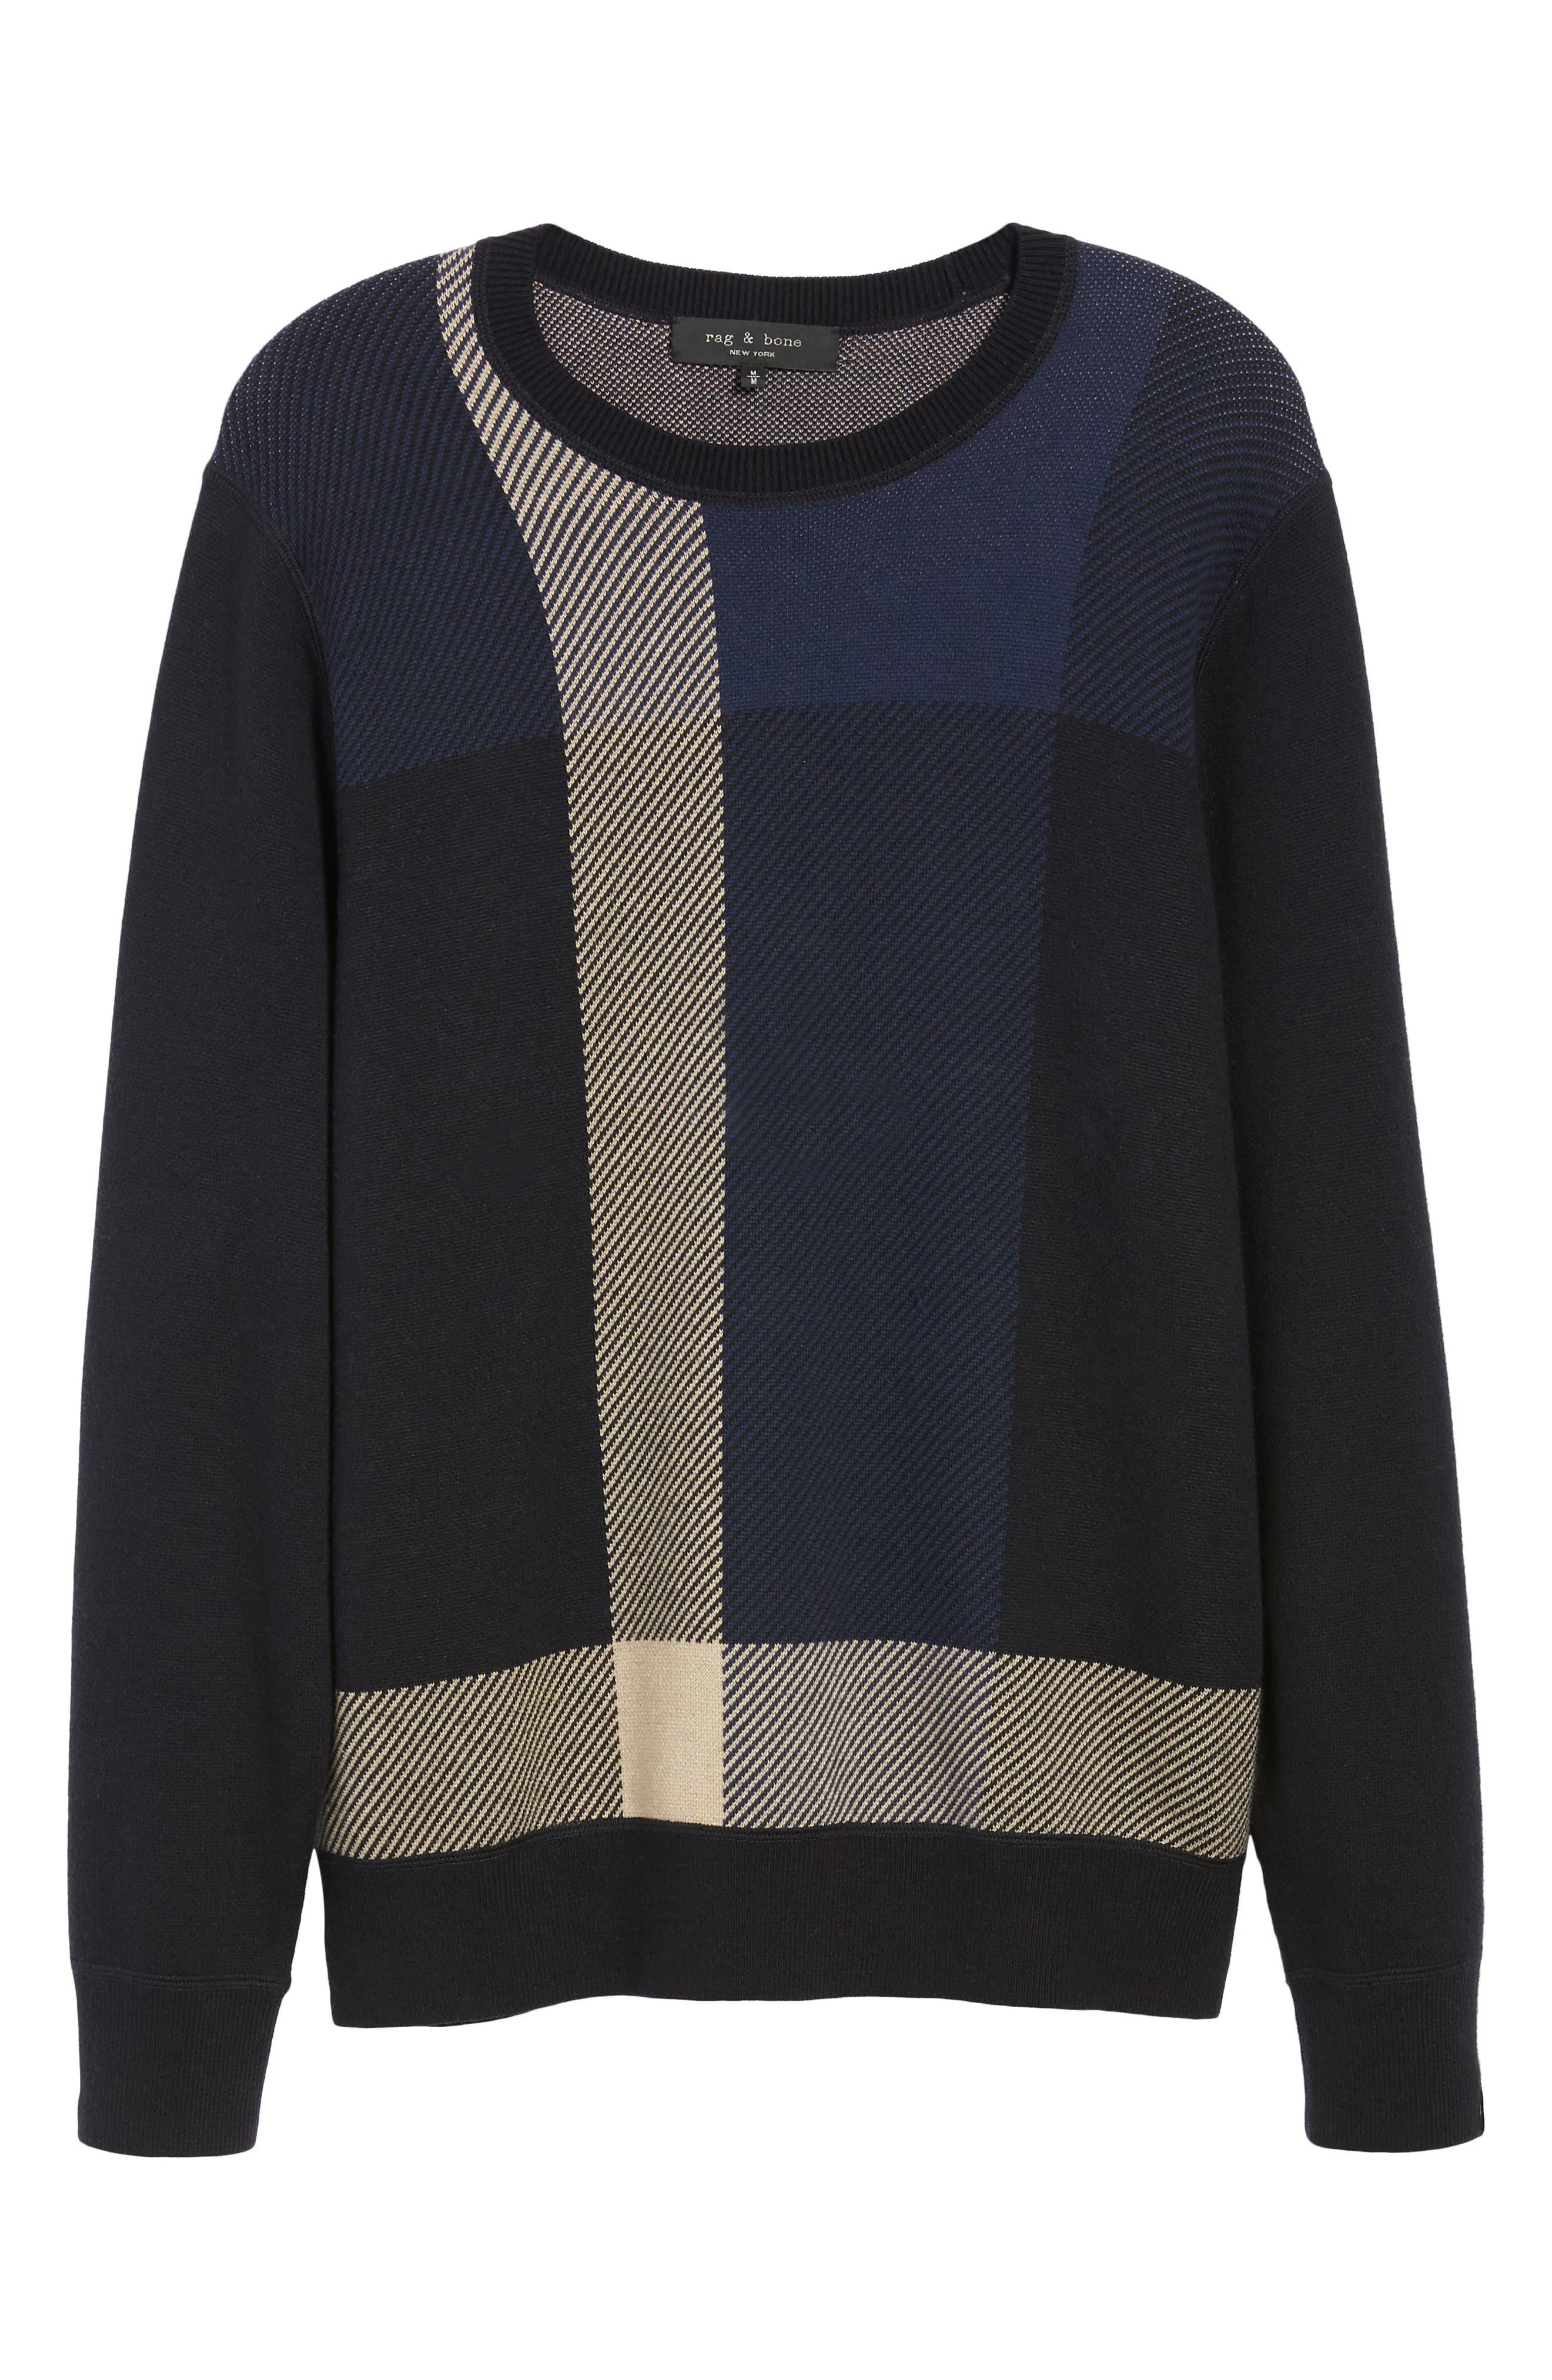 Marshall Crewneck Sweater,                             Alternate thumbnail 6, color,                             NAVY